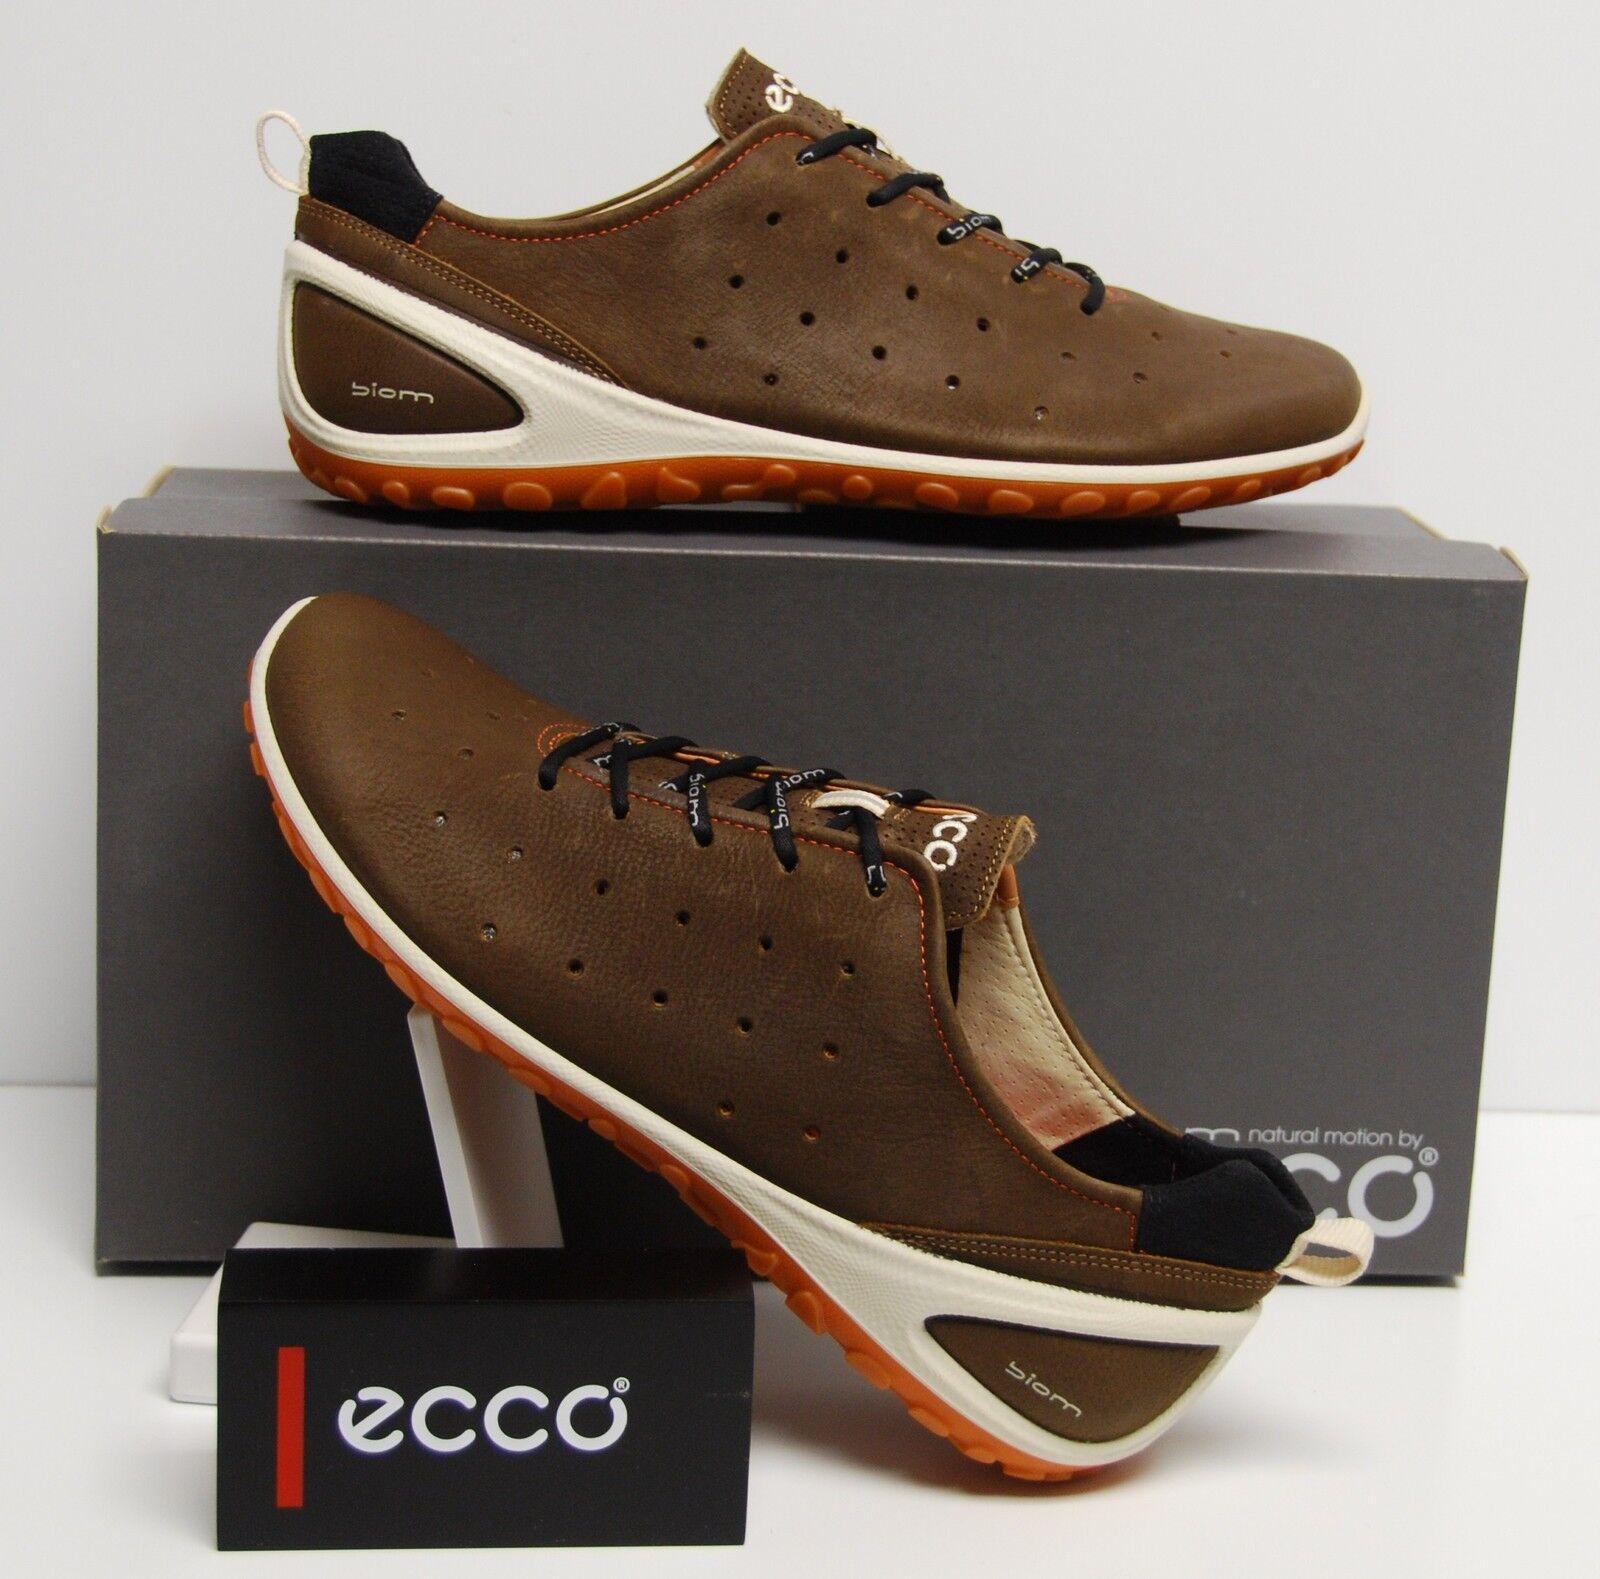 Offiziell Ecco Inglewood Slip on Halbschuhe In Cocoa Braun